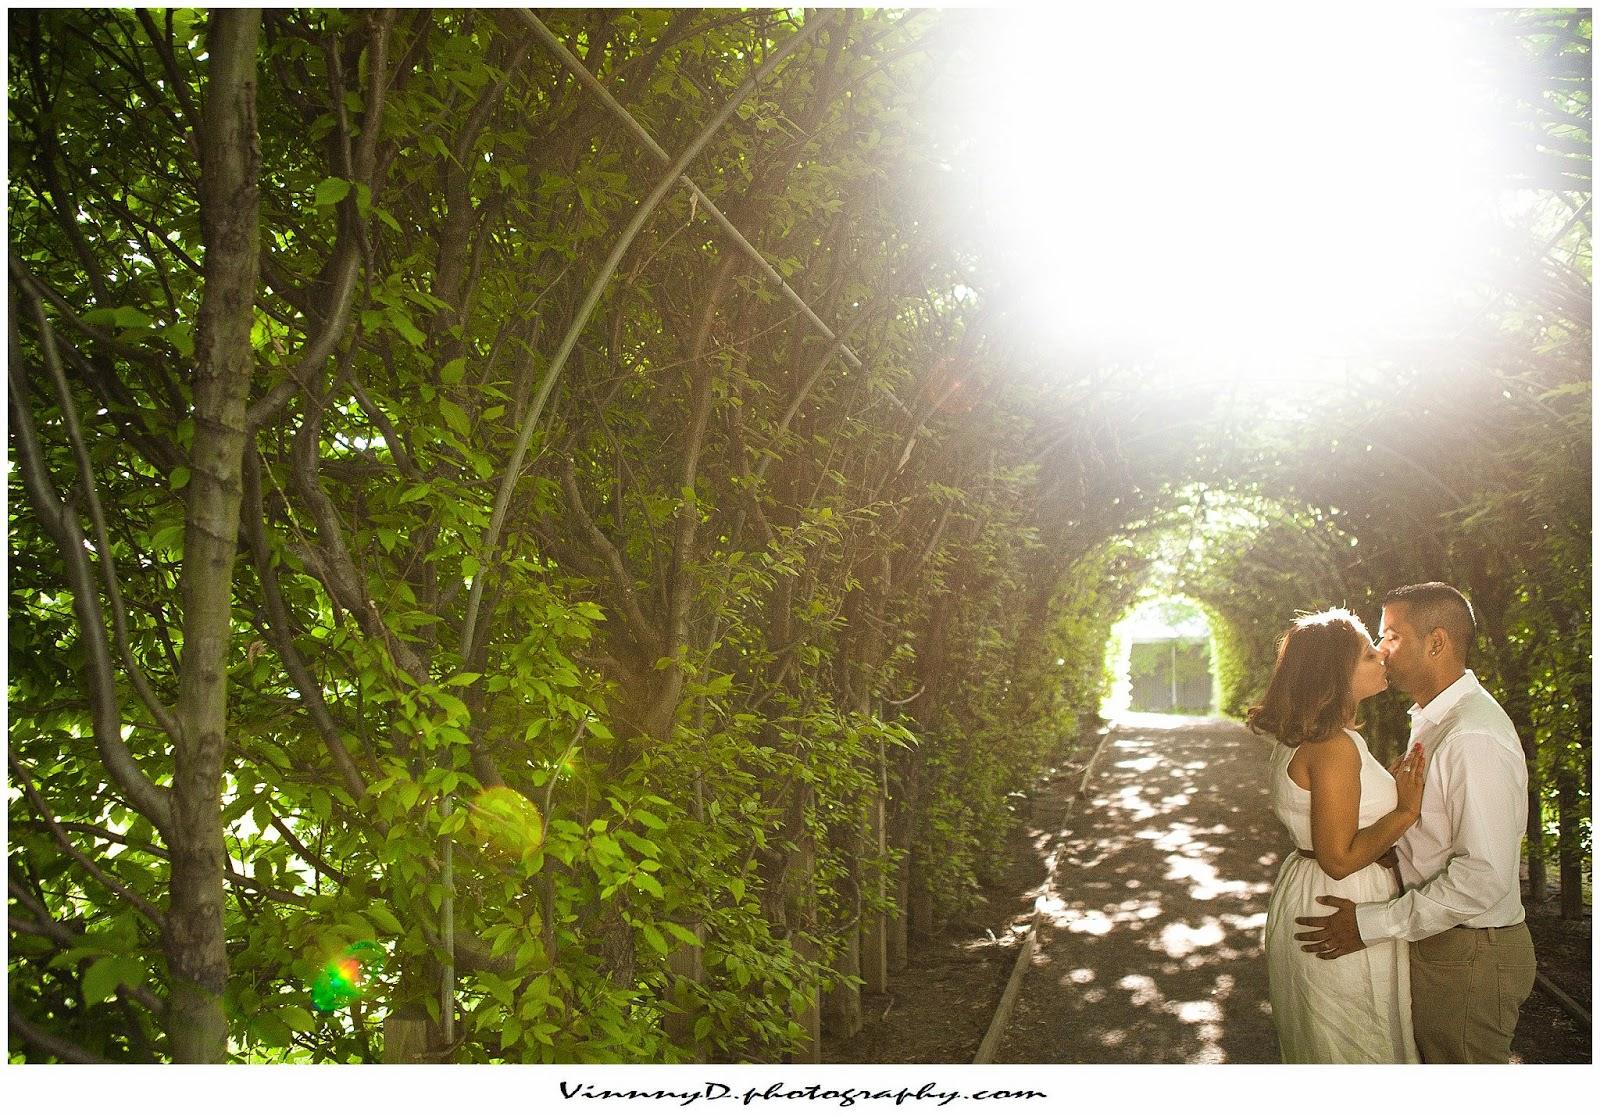 Samantha + Navin | Snug Harbor Botanical Garden, Staten Island